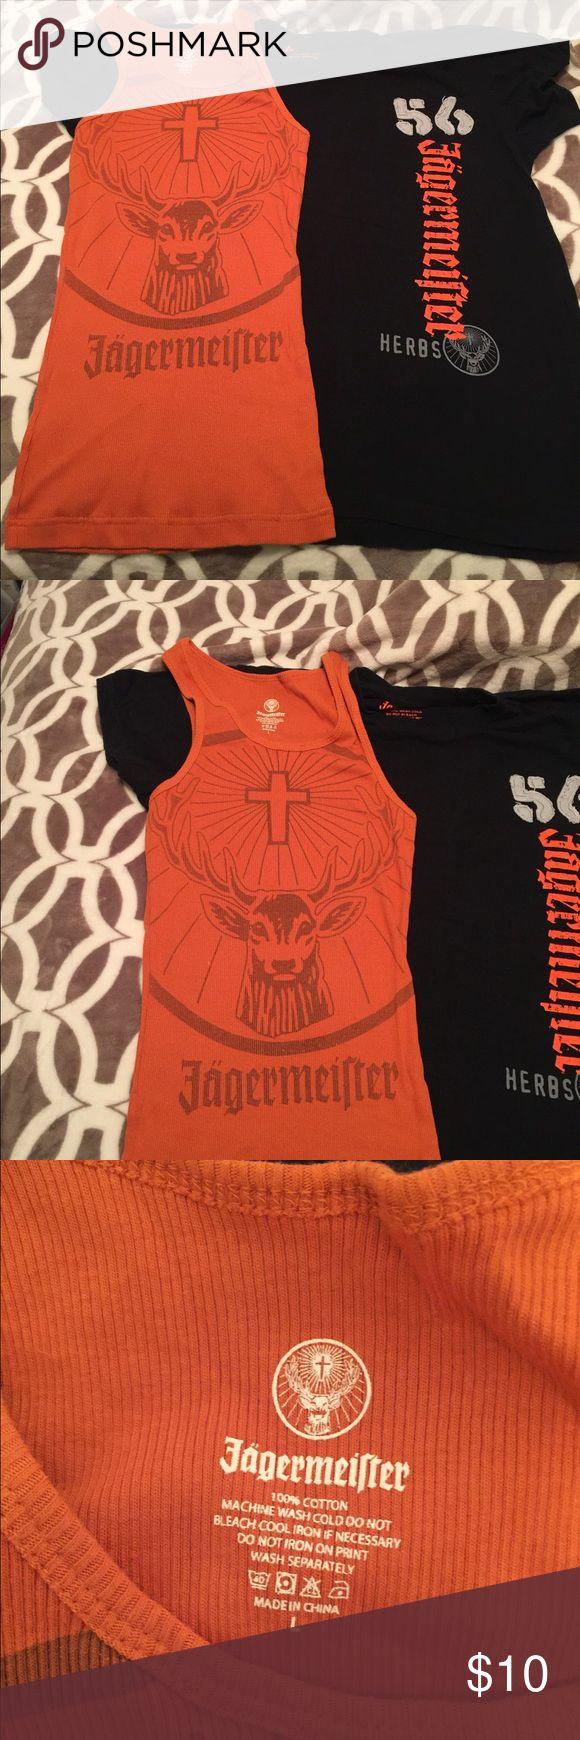 2 Large Jägermeister shirts One black L t- shirt one L orange tank top you get both Tops